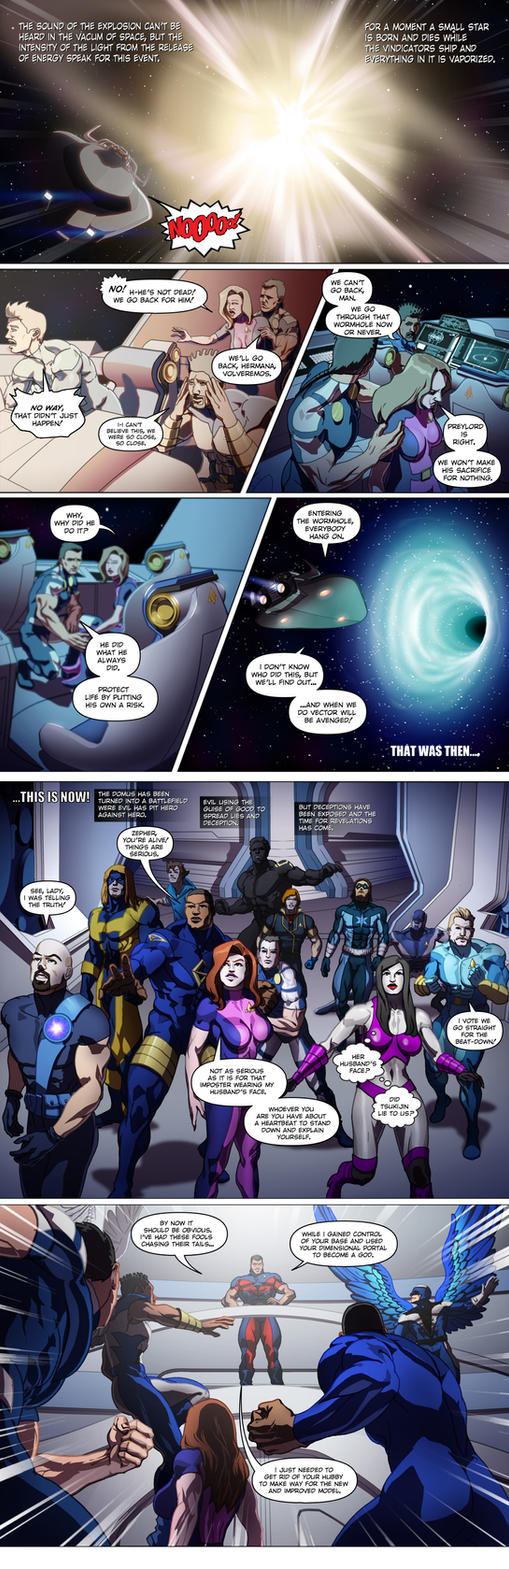 MOCC 2 Final Chapter p27-28 by RODCOM1000